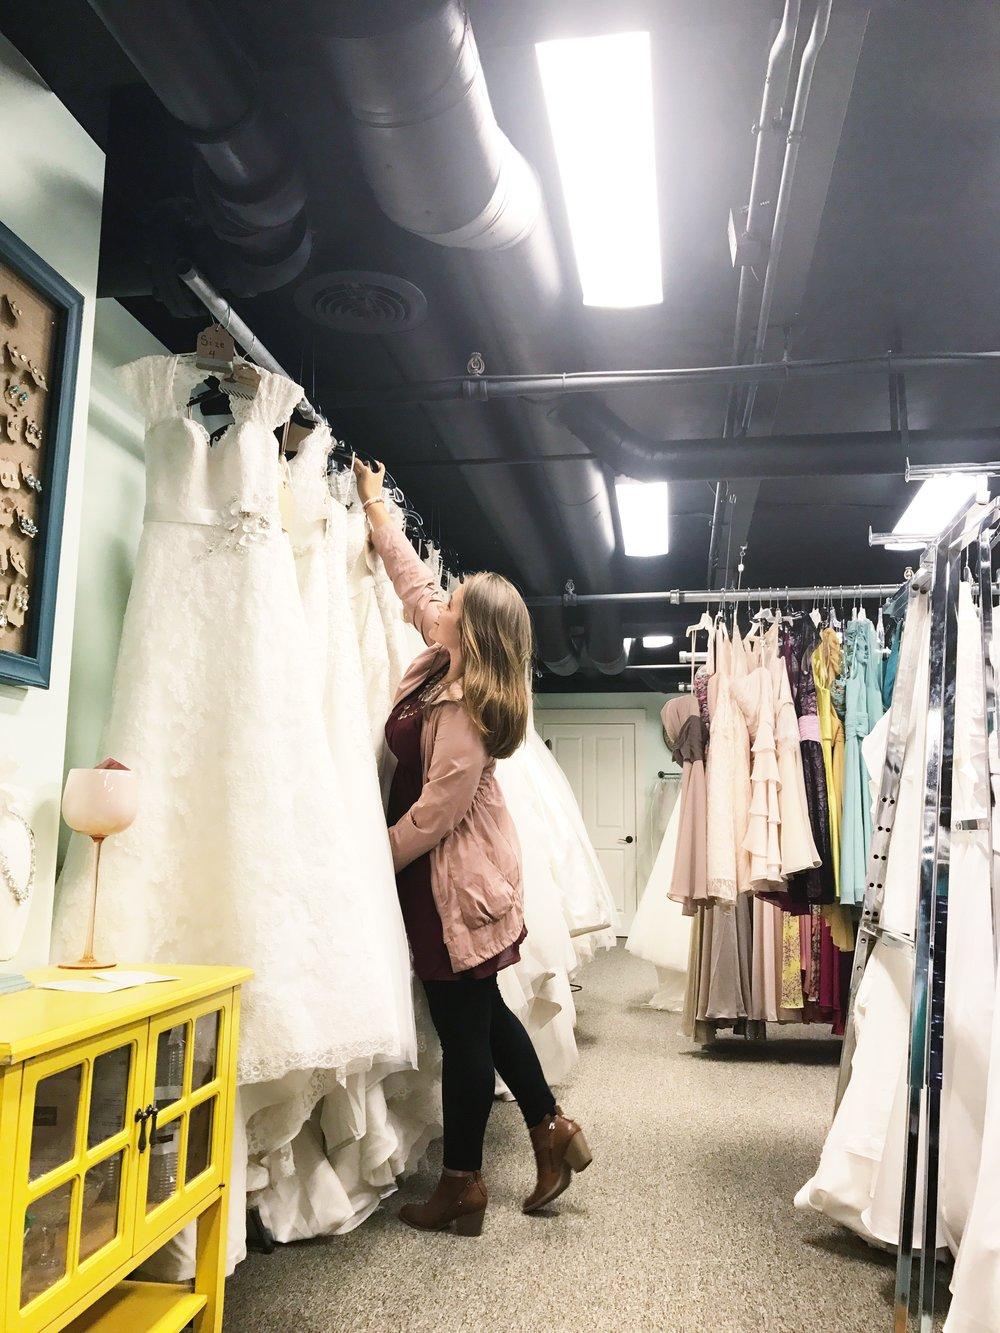 senecasbridal_montrosepa_binghamtonny_weddingdressstores